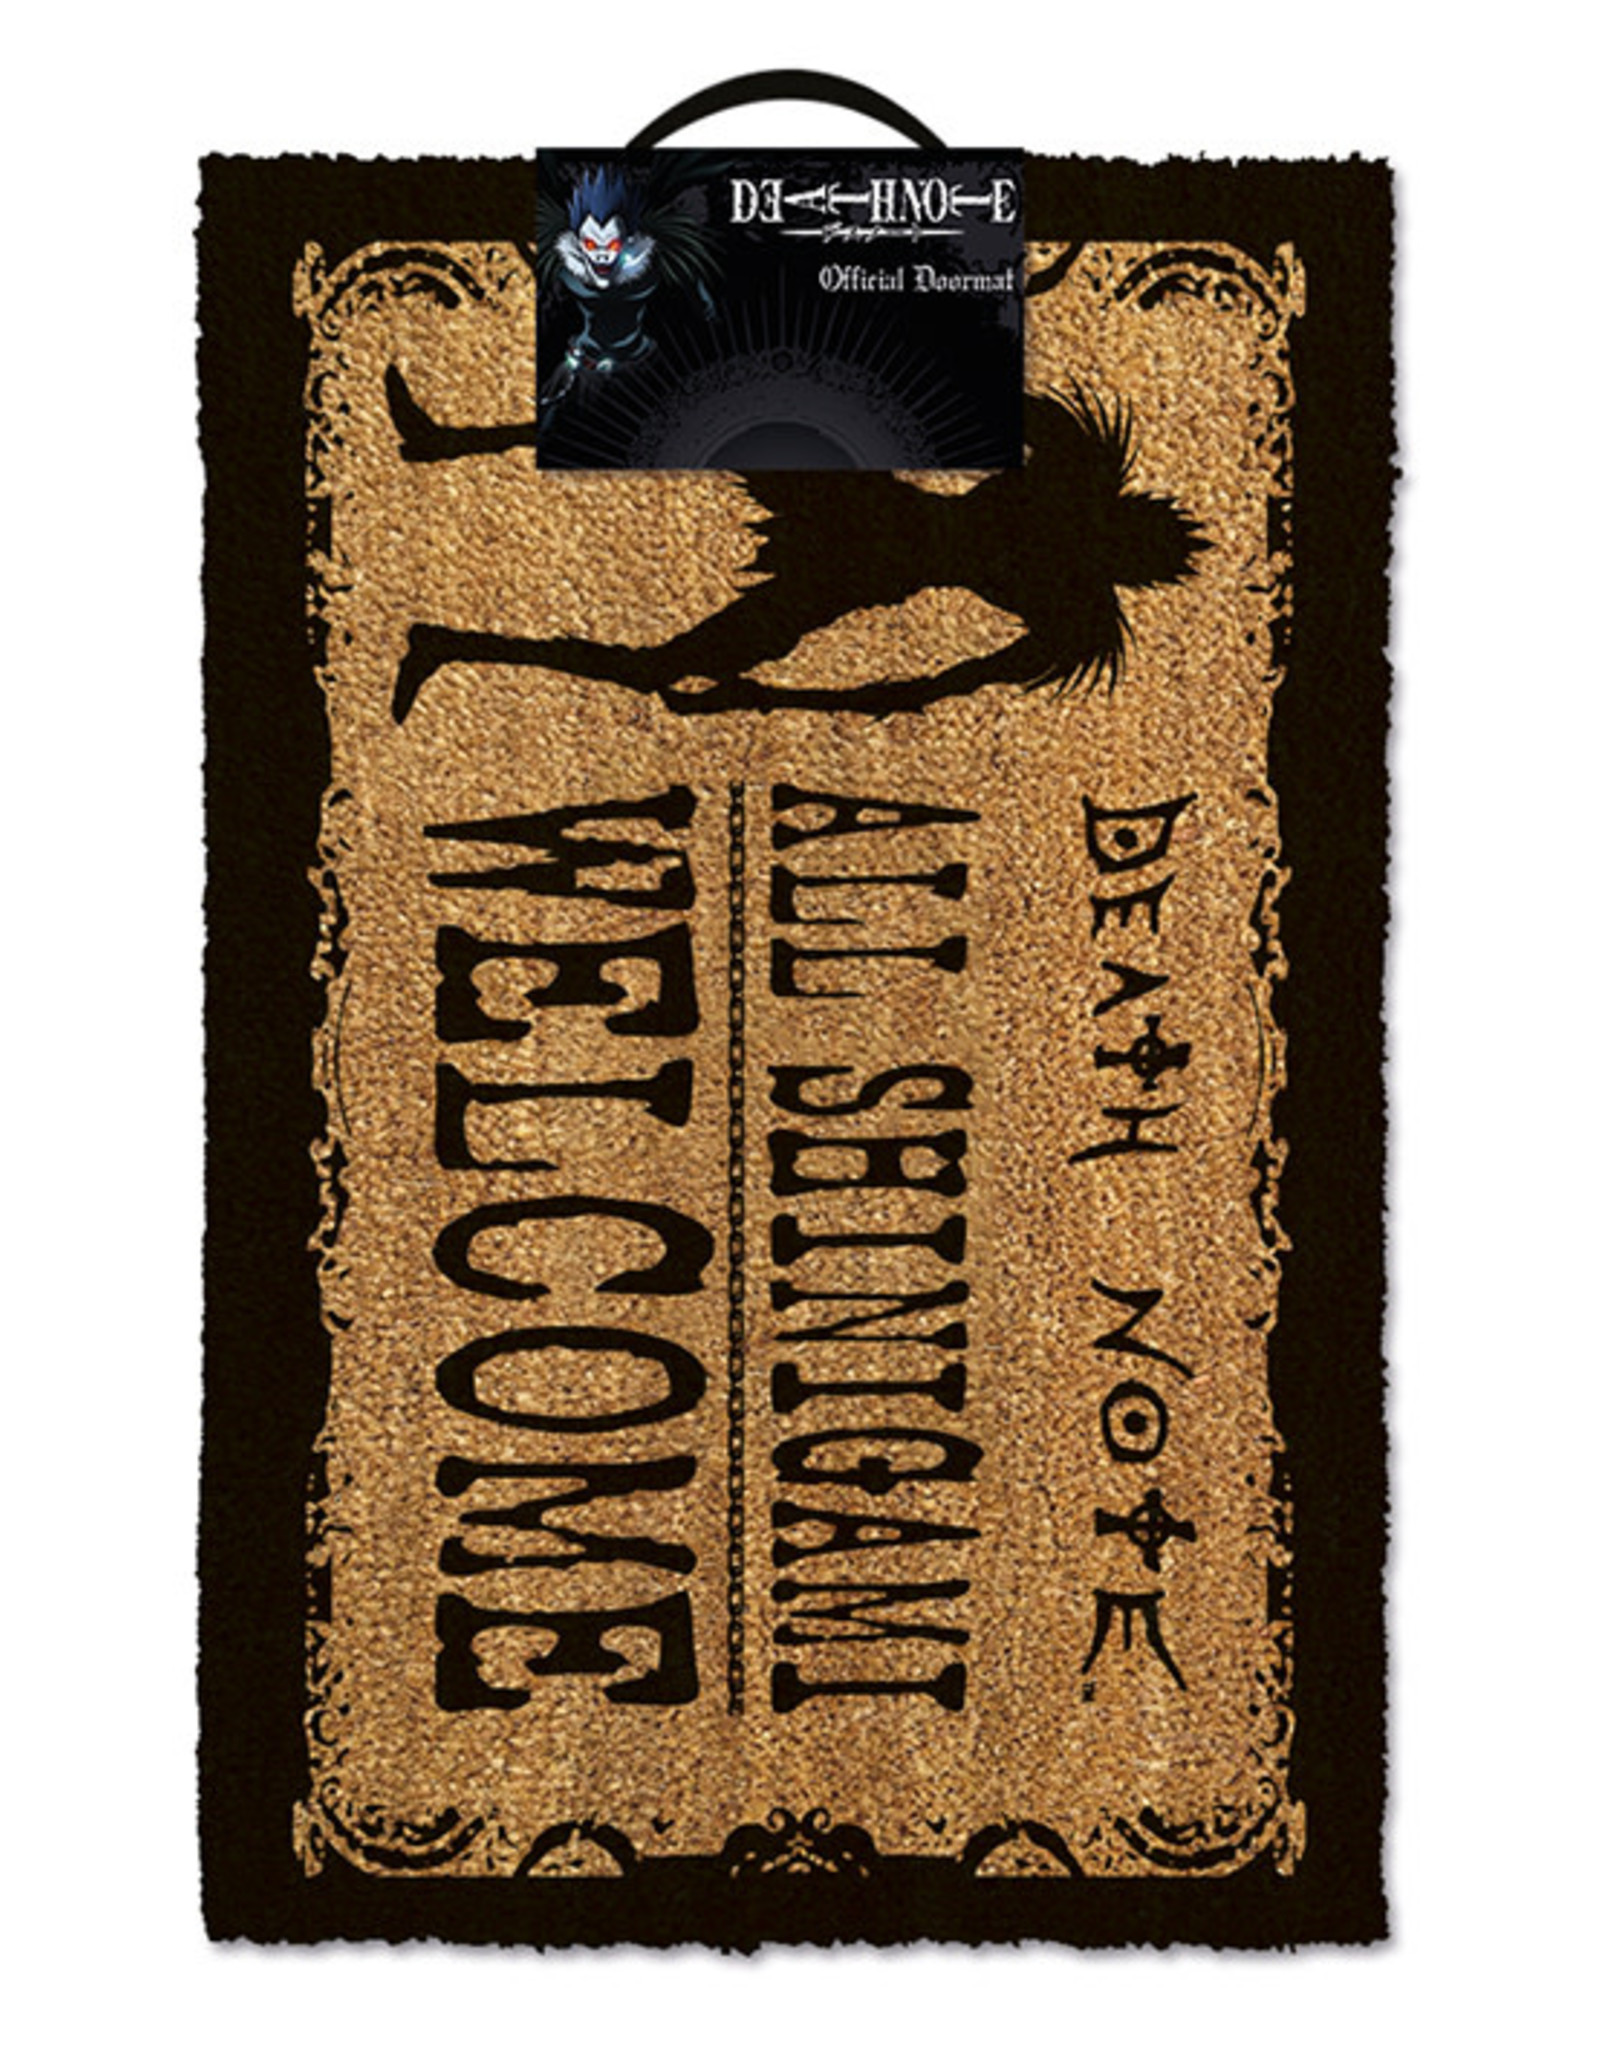 DEATH NOTE Doormat 40x60 - Shinigami Welcome